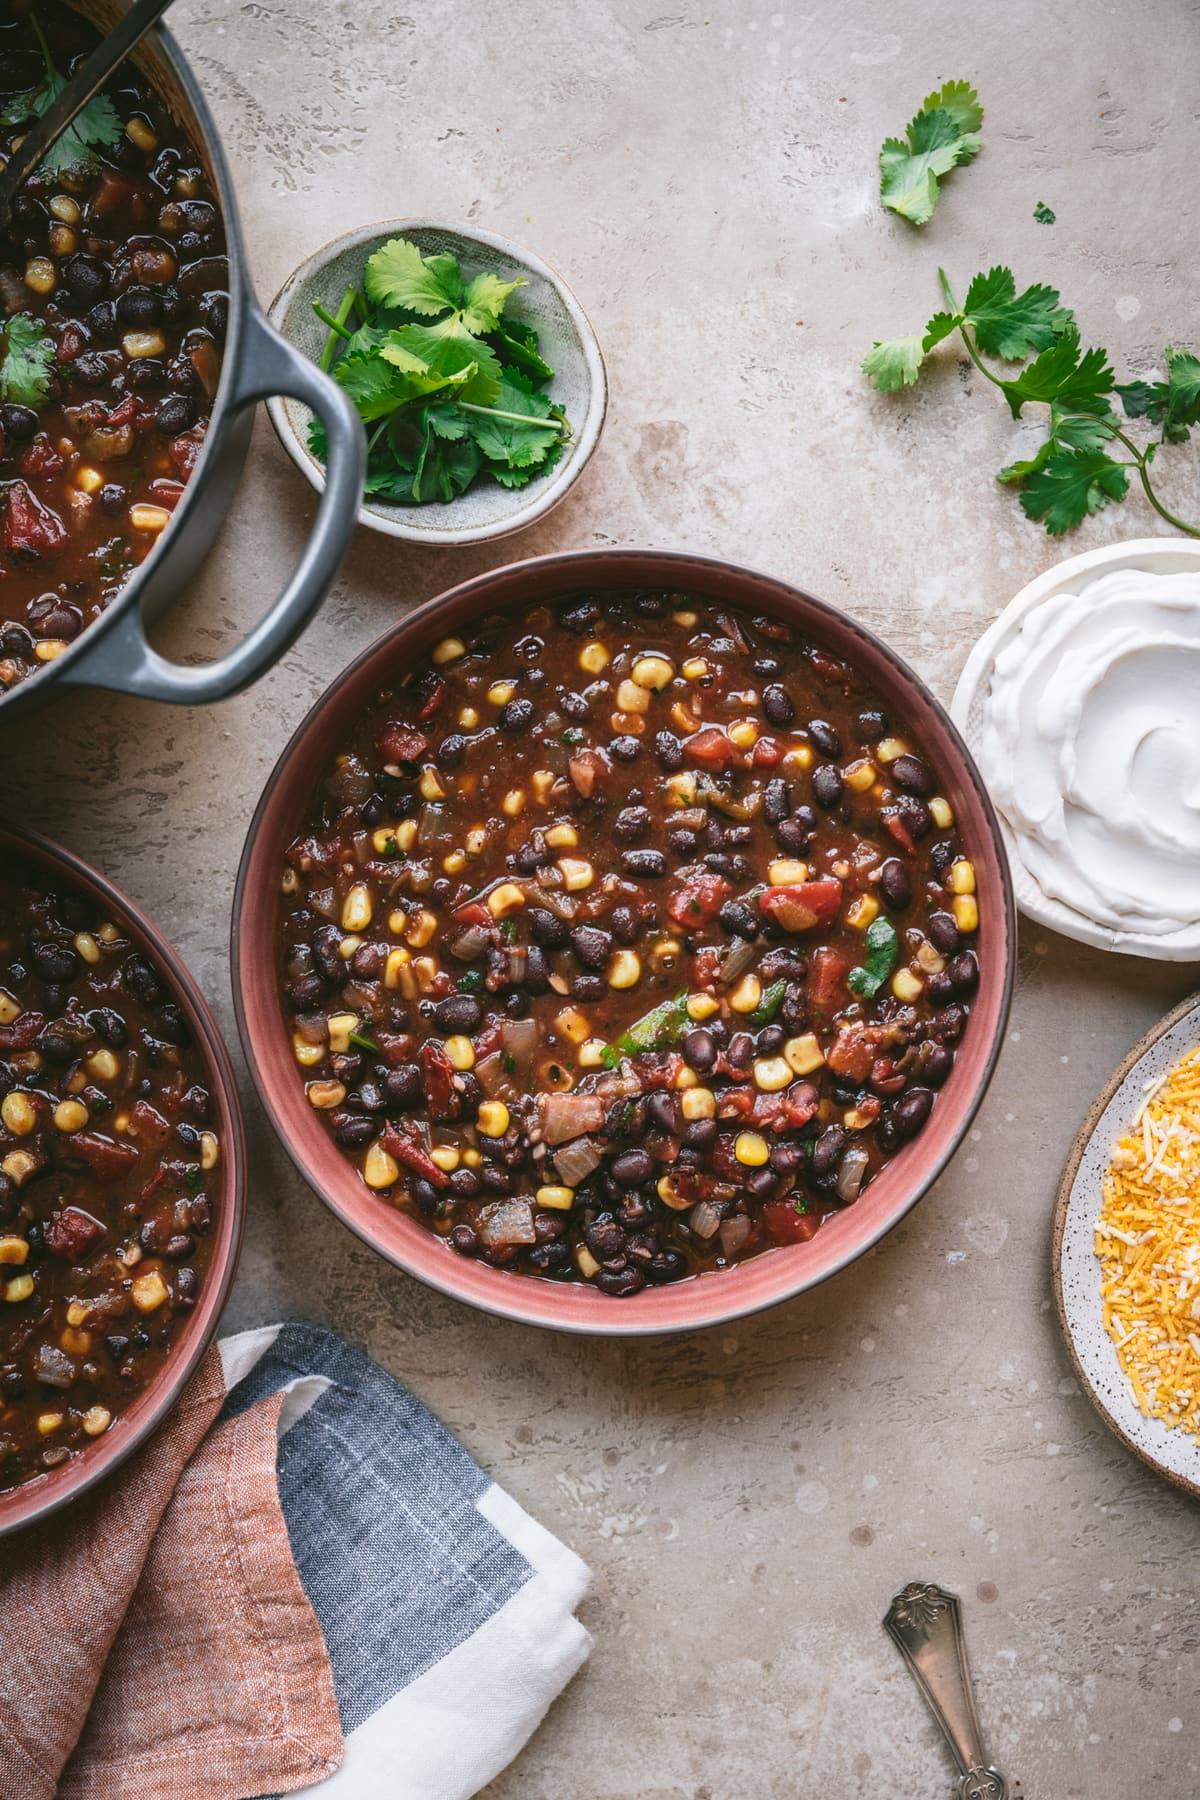 overhead view of vegan black bean tomato soup in bowl